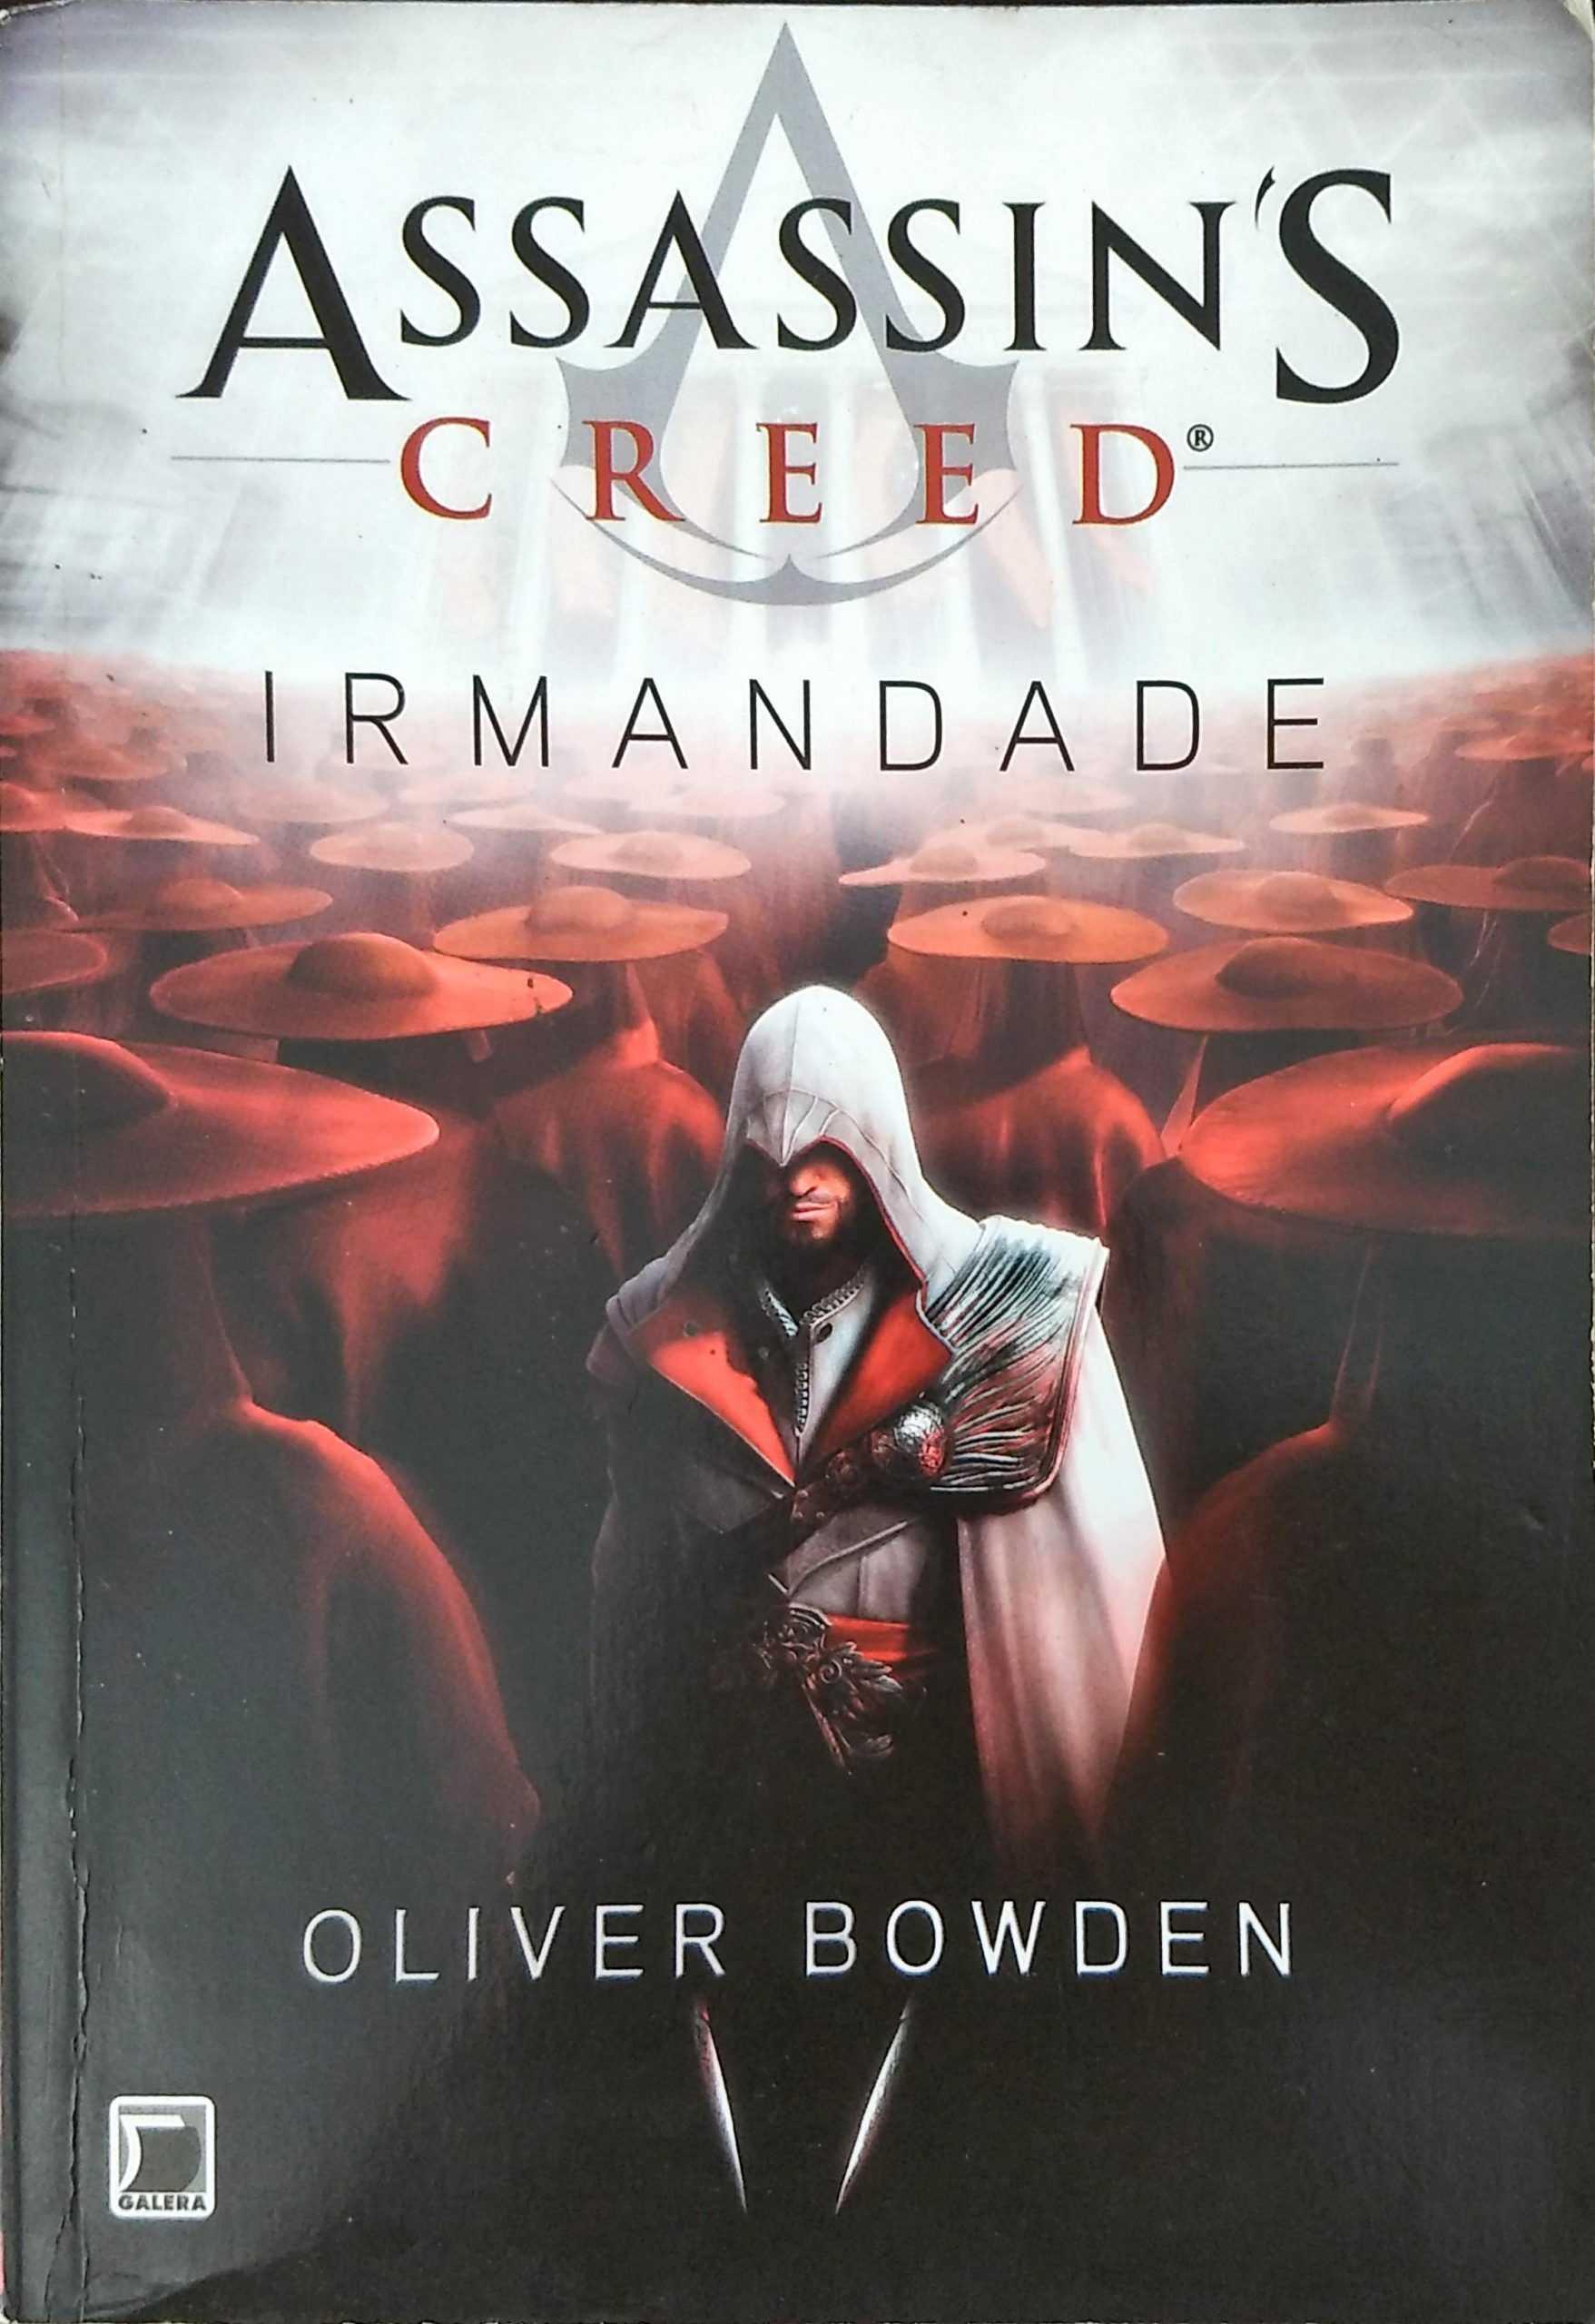 Assassin's Creed – Irmandade – Oliver Bowden